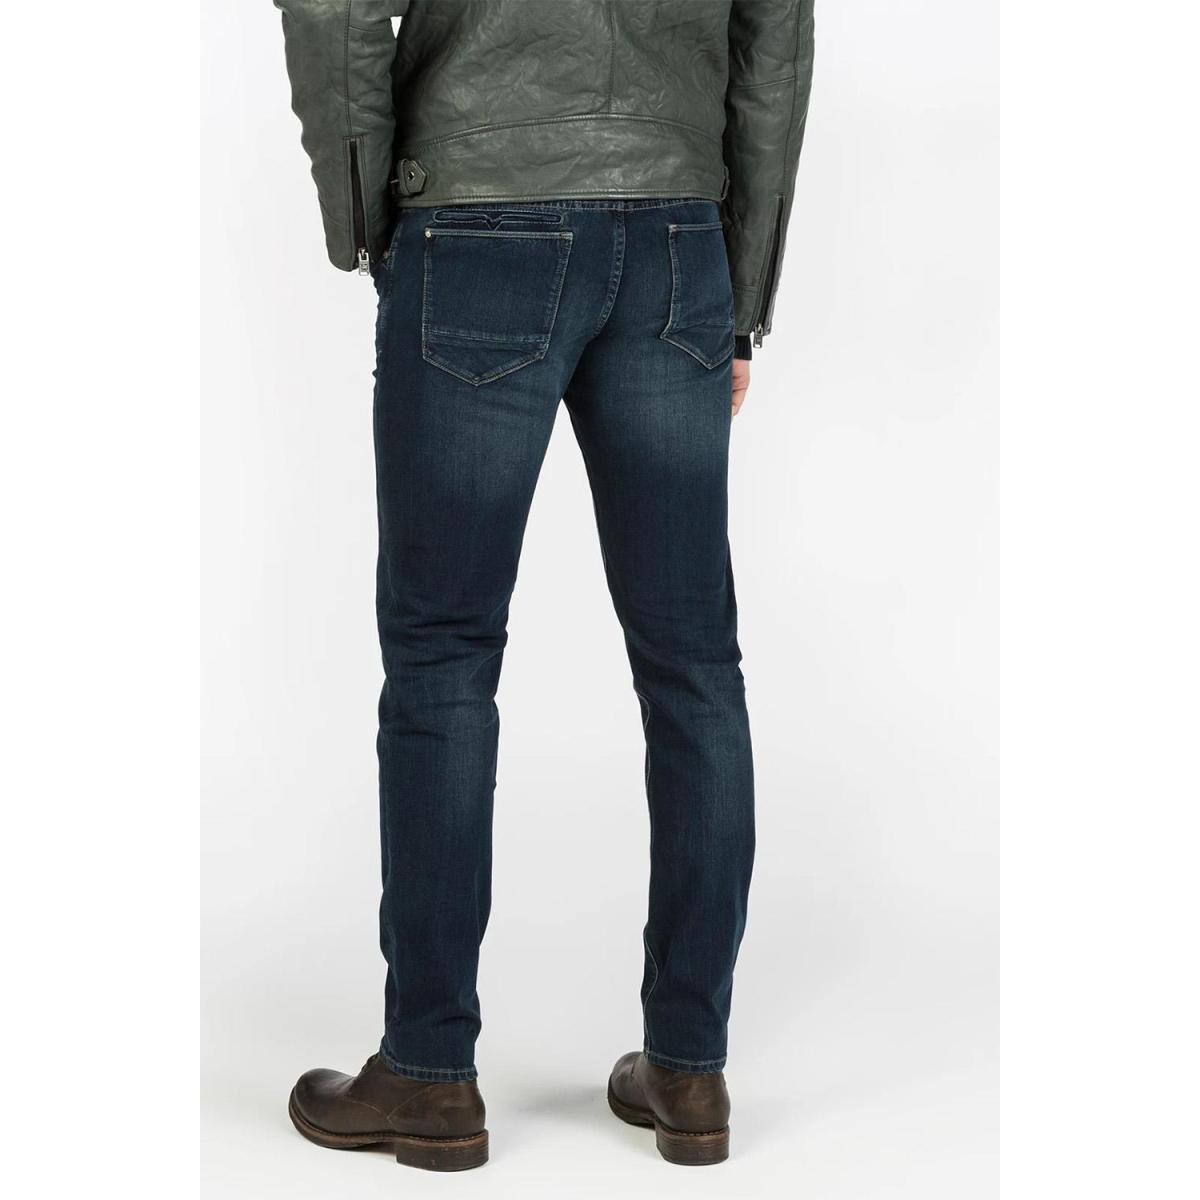 v850 rider vtr850 vanguard jeans mfw